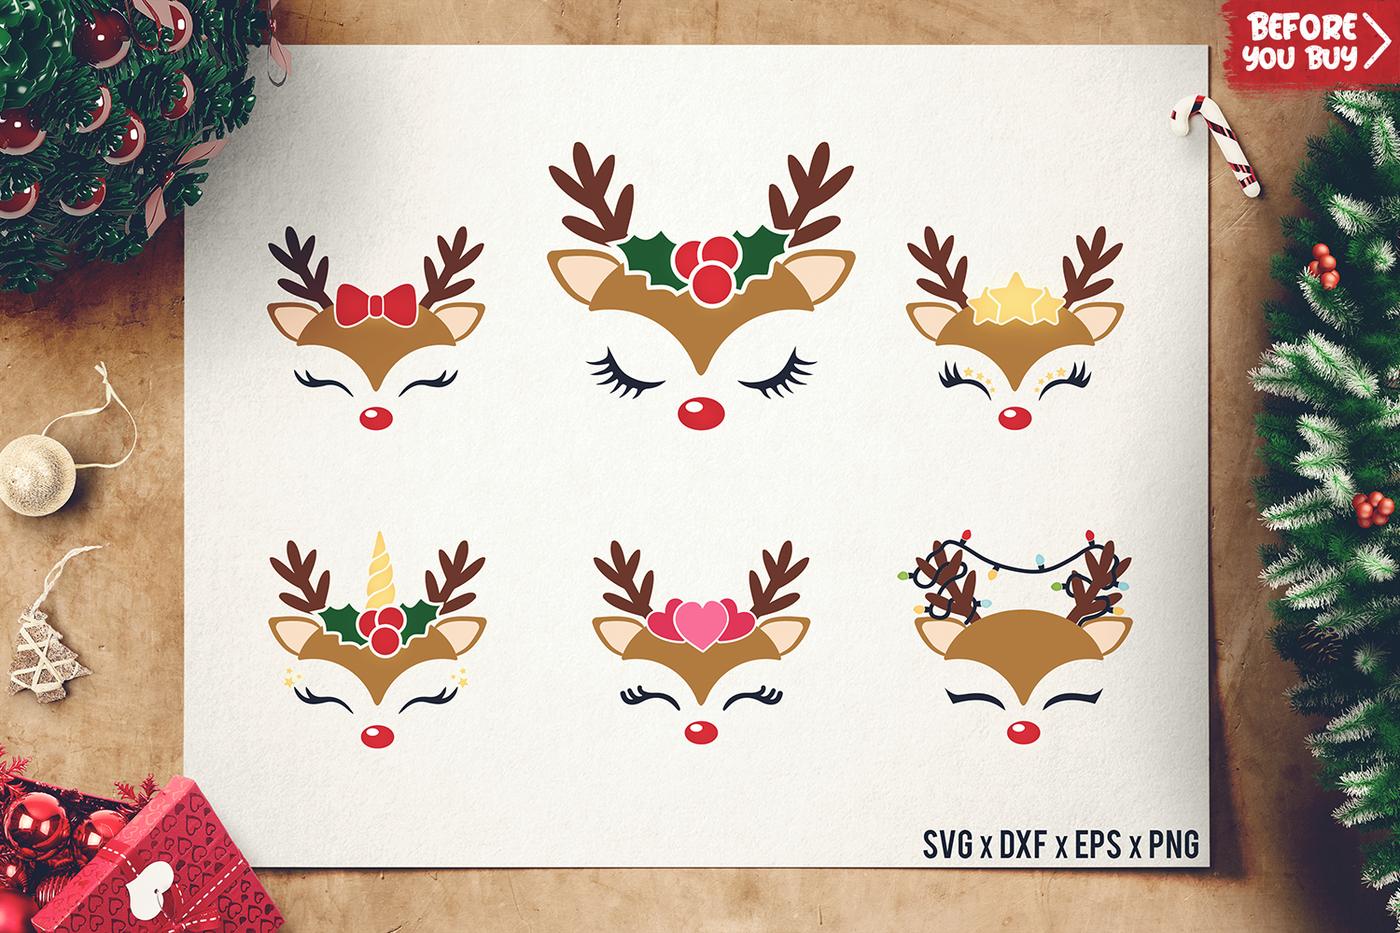 Reindeer Faces Svg Christmas Reindeer Cut Files Dxf By